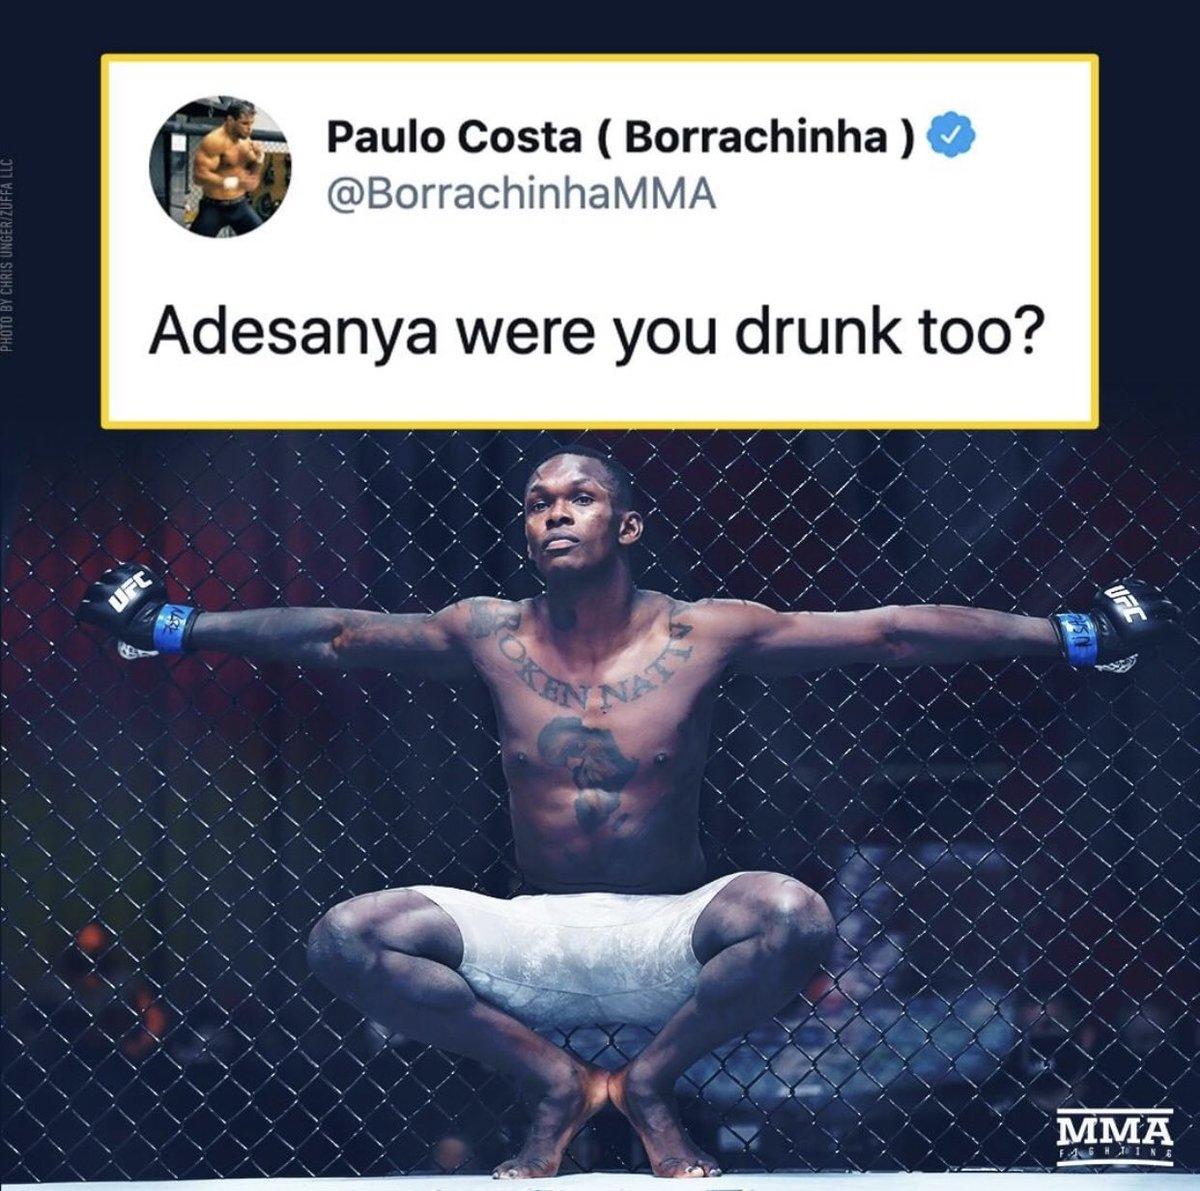 What MotherFuc**r 🤣🤣🤣🤣  #UFC #combat #combatsports #nigeria #lagos #israeladesanya #blachowicz #poland #ufc259#adesanya #ko #fight #baston #martialart #boxing #mma #afrique #janblachowicz #warrior #warsaw #warszawa #africa #PauloCosta #wine #drunk